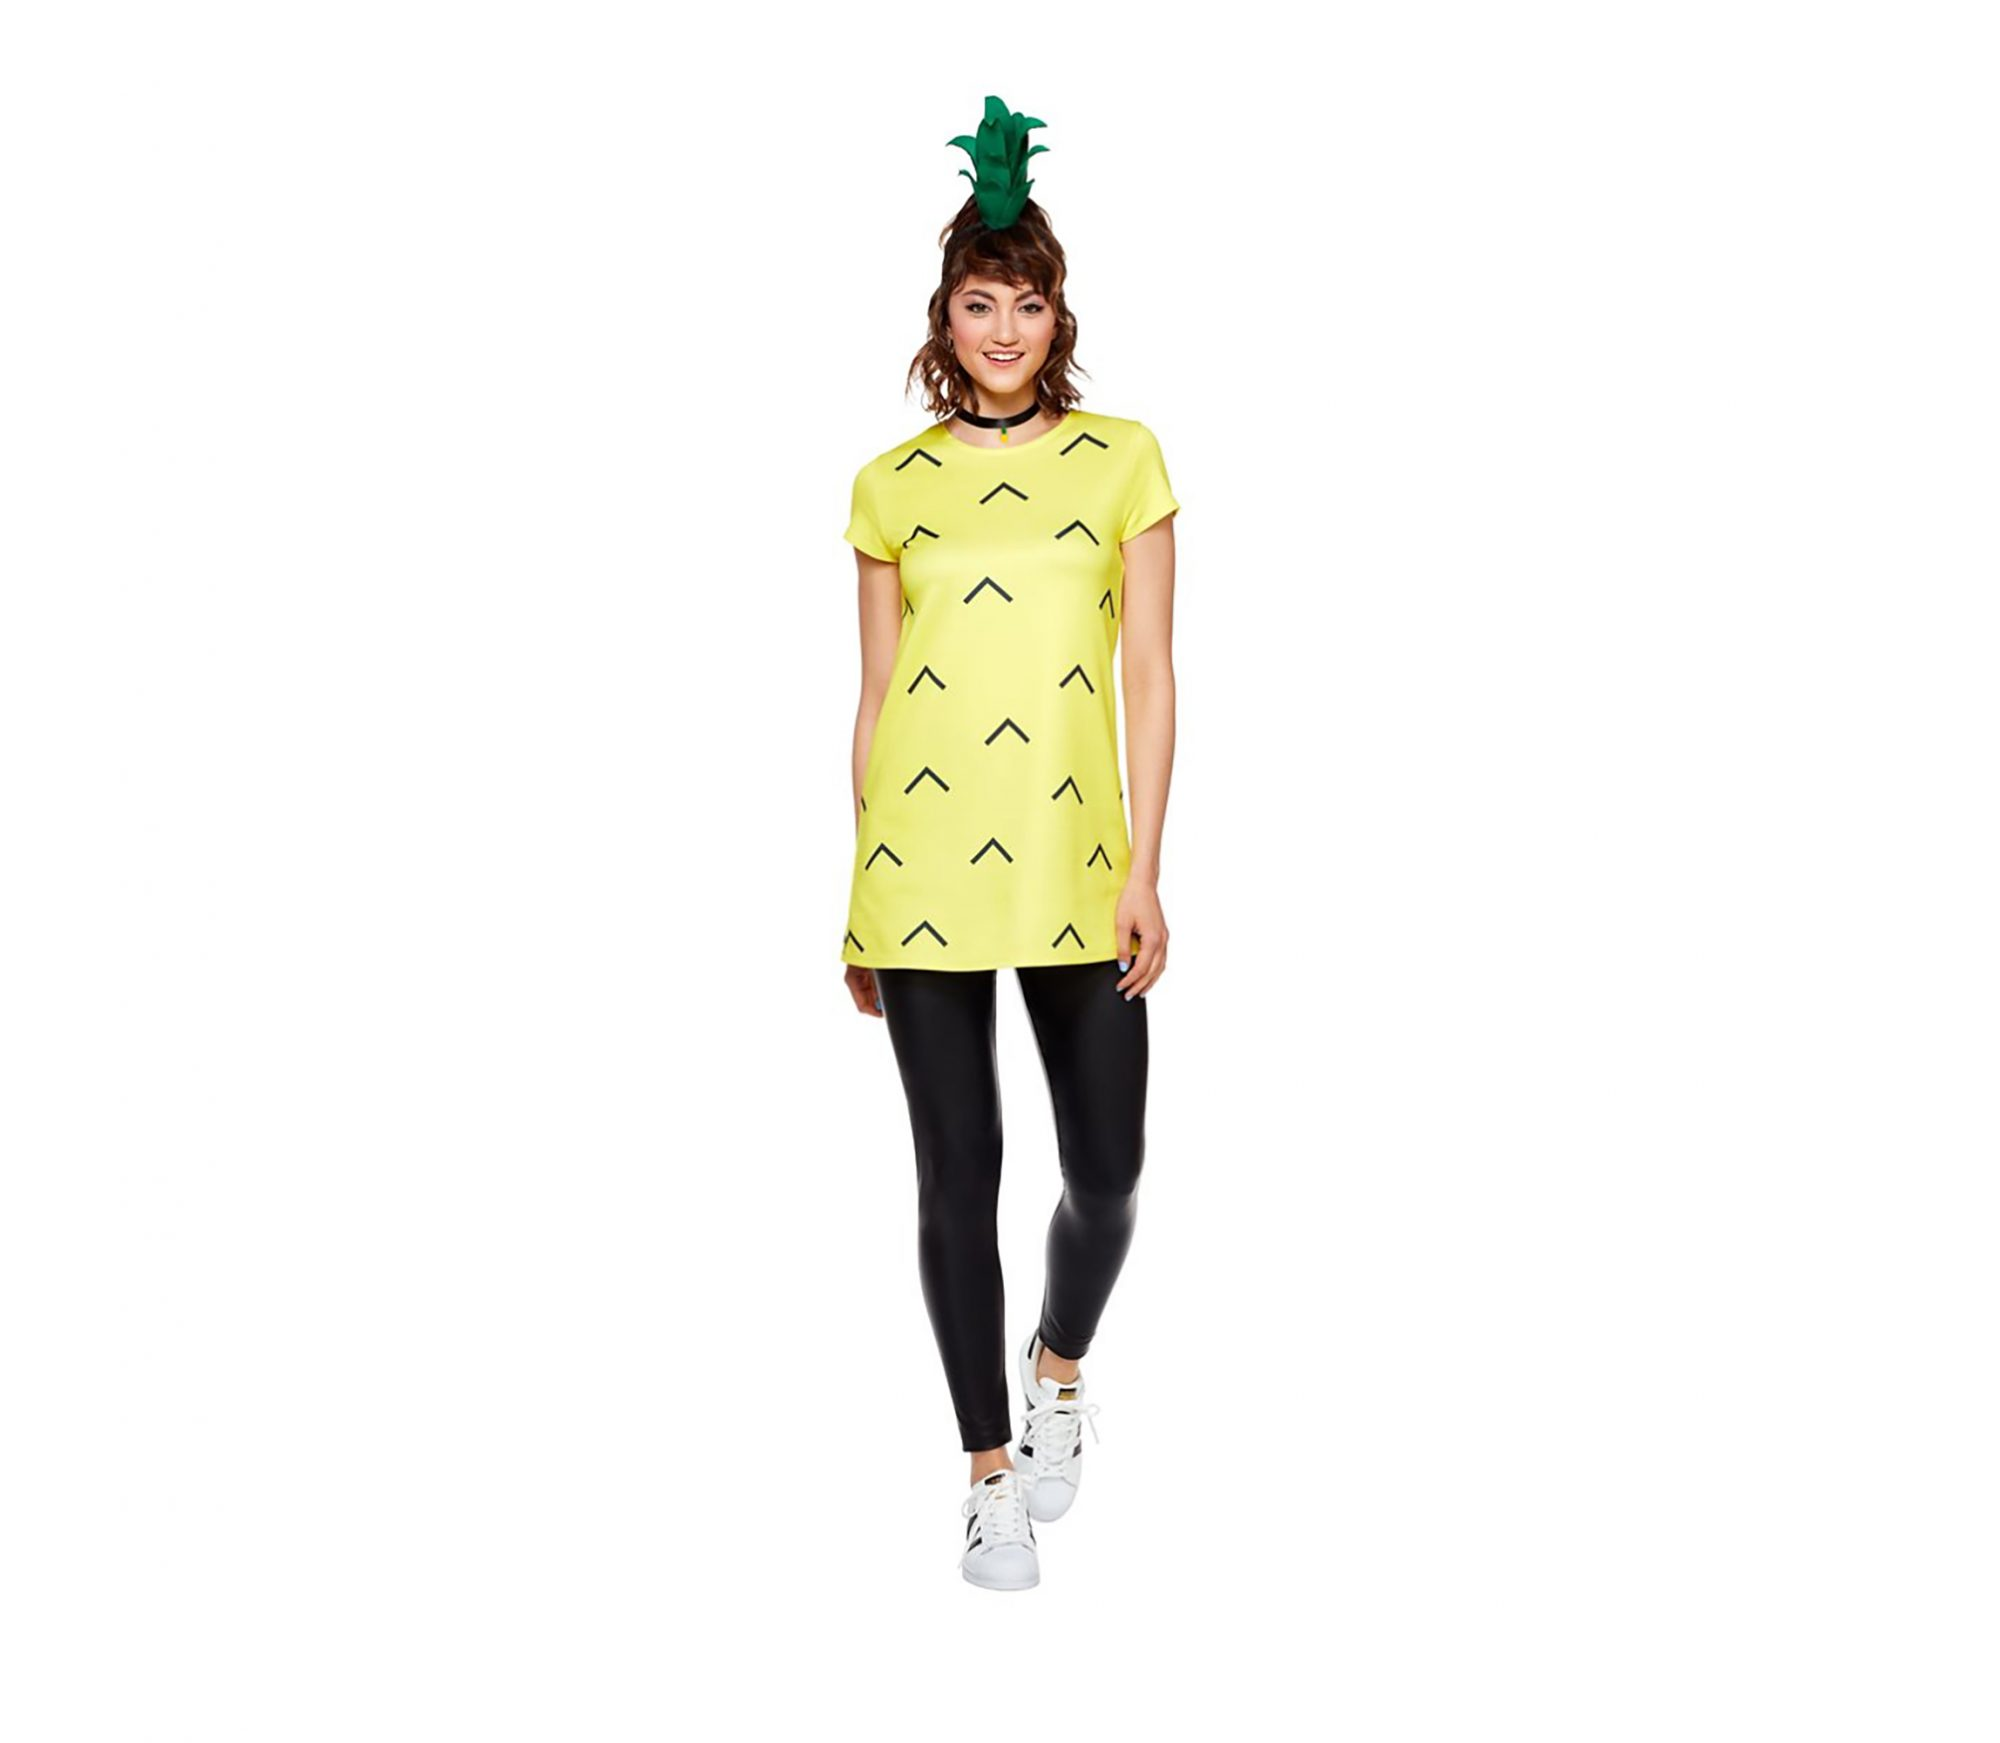 1709w-Pineapple-Costume.jpg